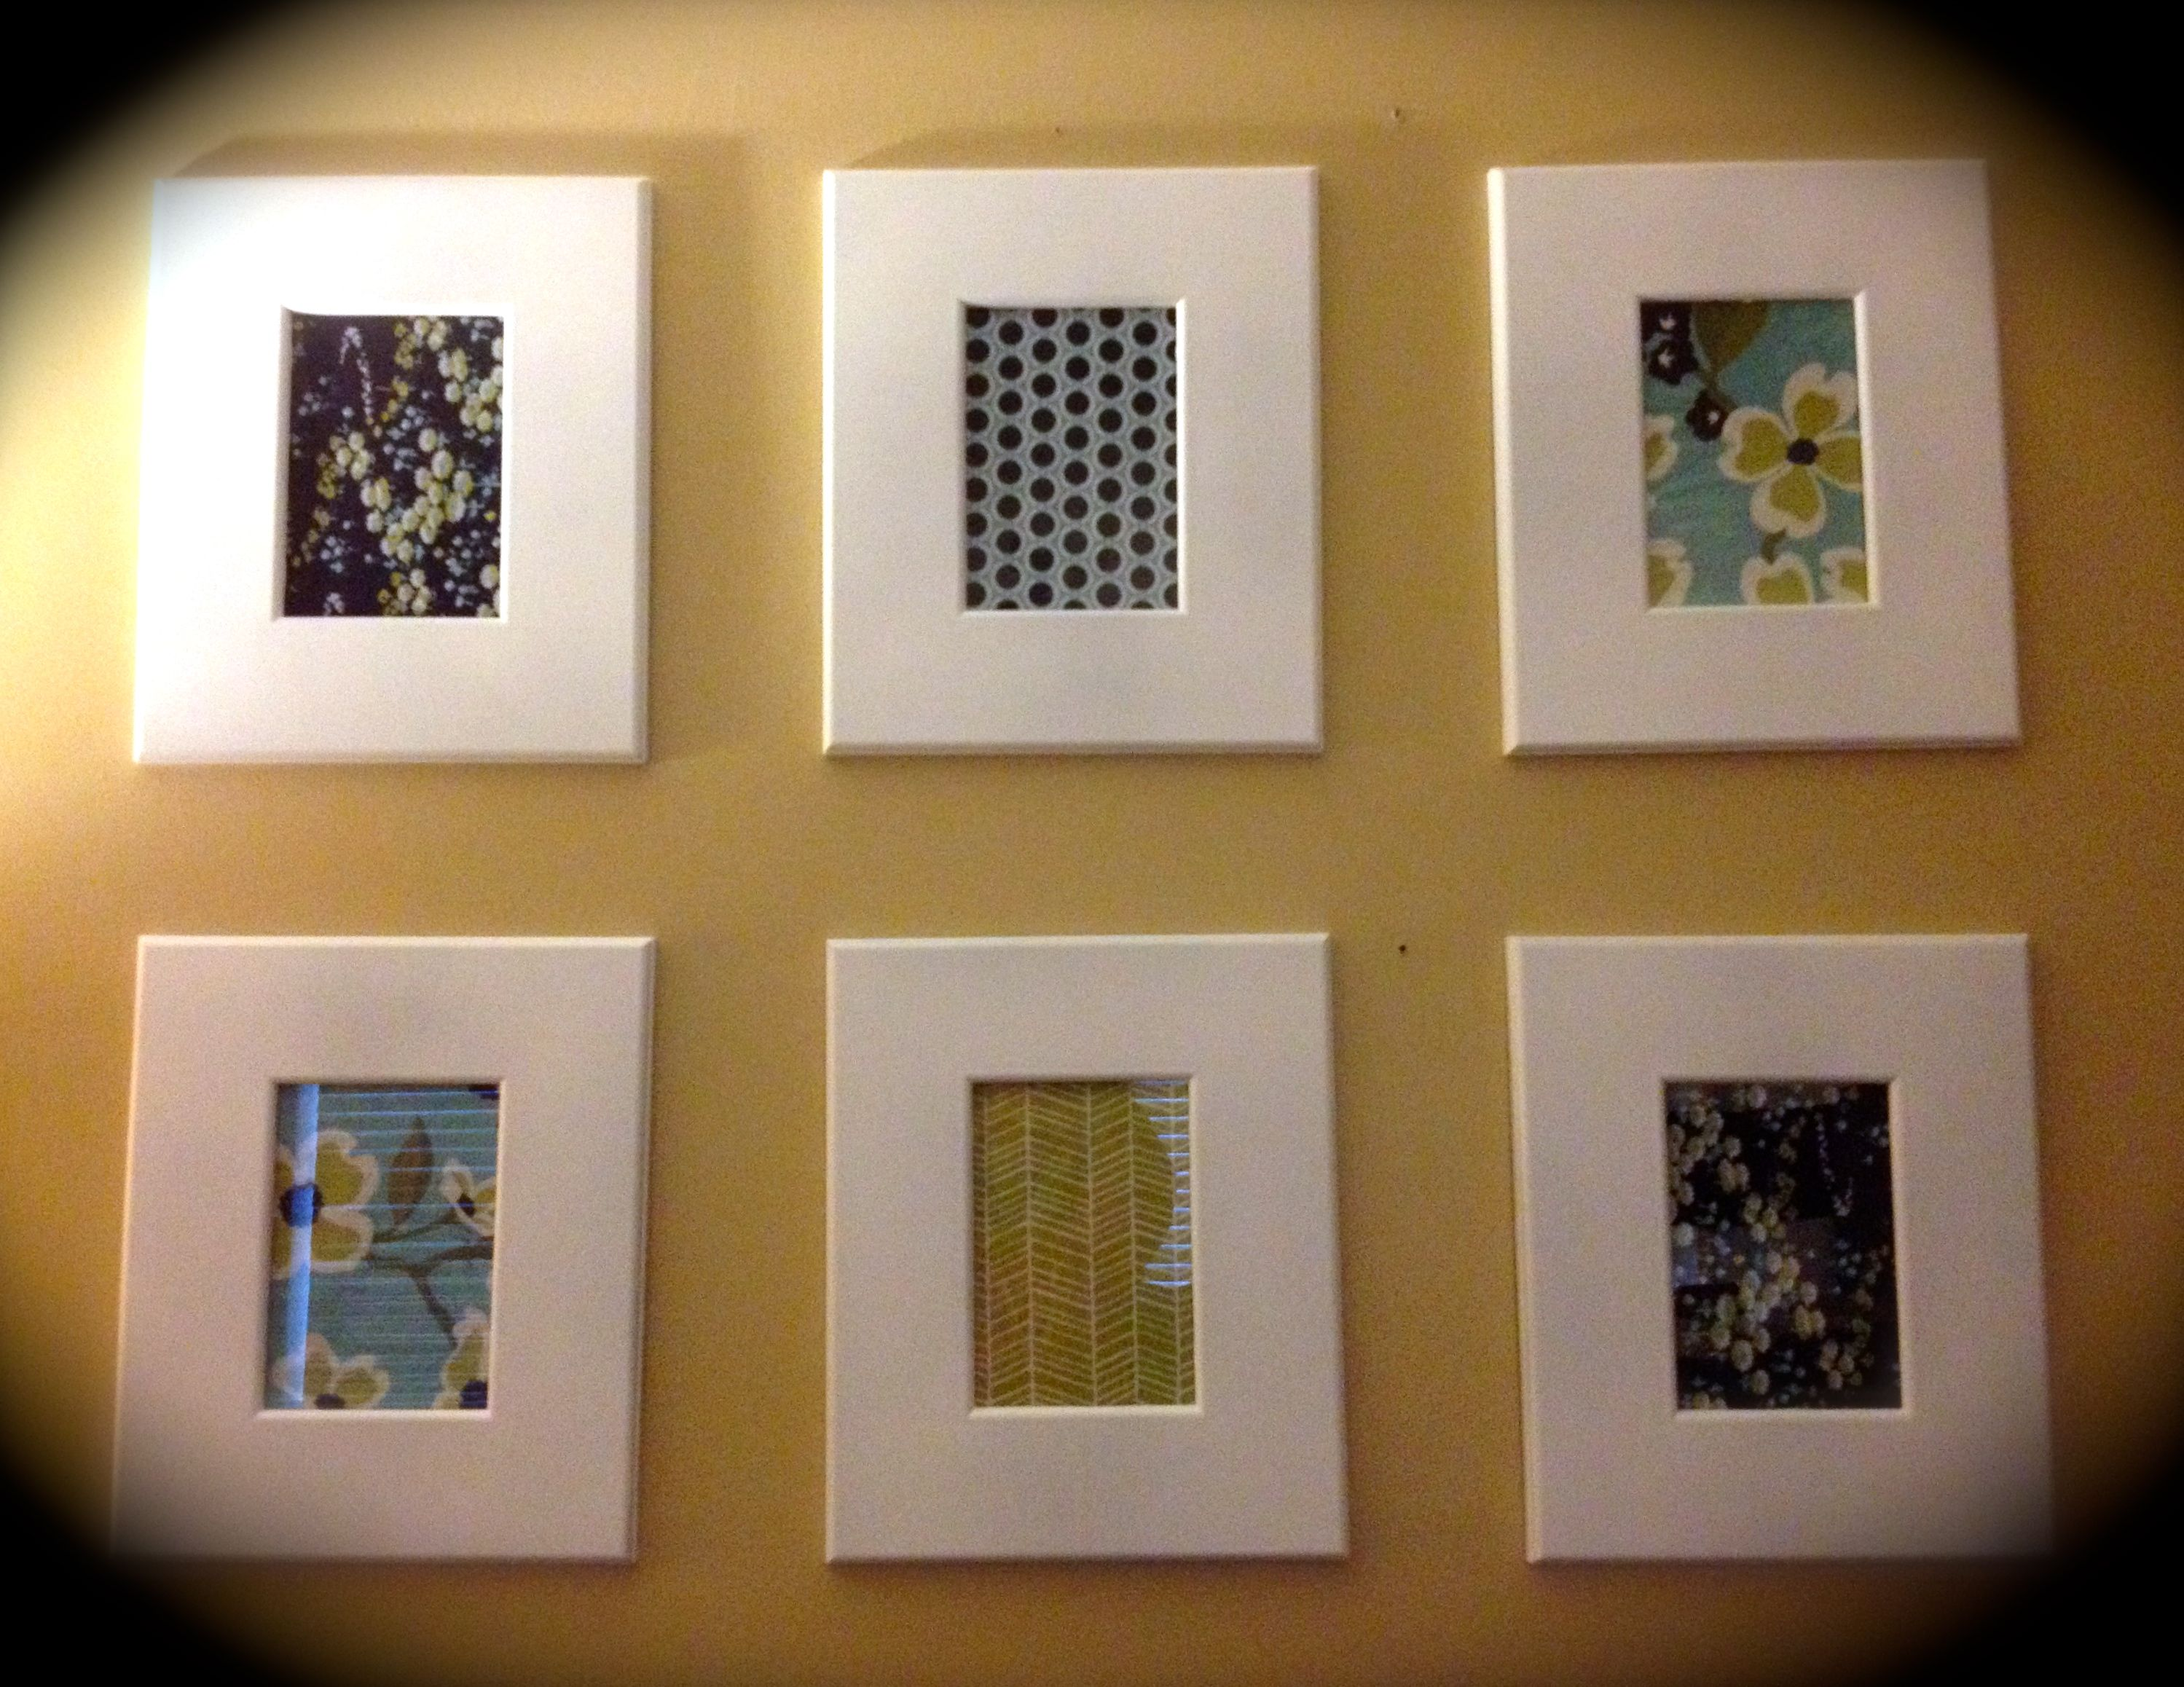 Diy framed fabric inexpensive wall art eat well spend smart diy framed fabric inexpensive wall art solutioingenieria Gallery